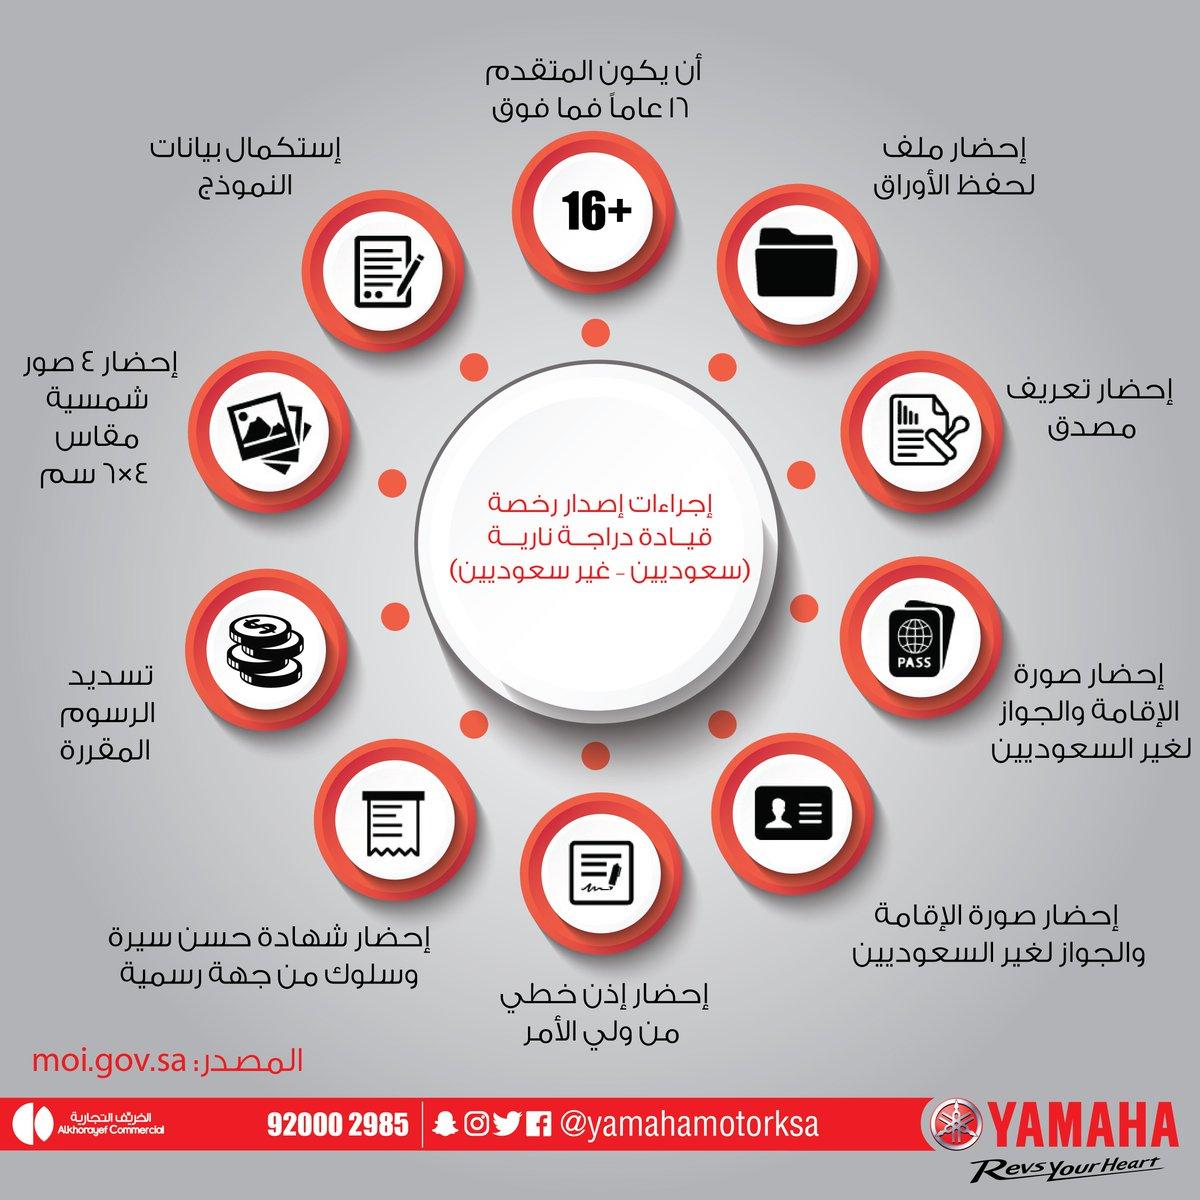 Yamaha Motor Ksa בטוויטר إجراءات إصدار رخصة قيادة دراجة نارية سعوديين غير سعوديين ياماها السعودية إصدار رخصة دراجات نارية